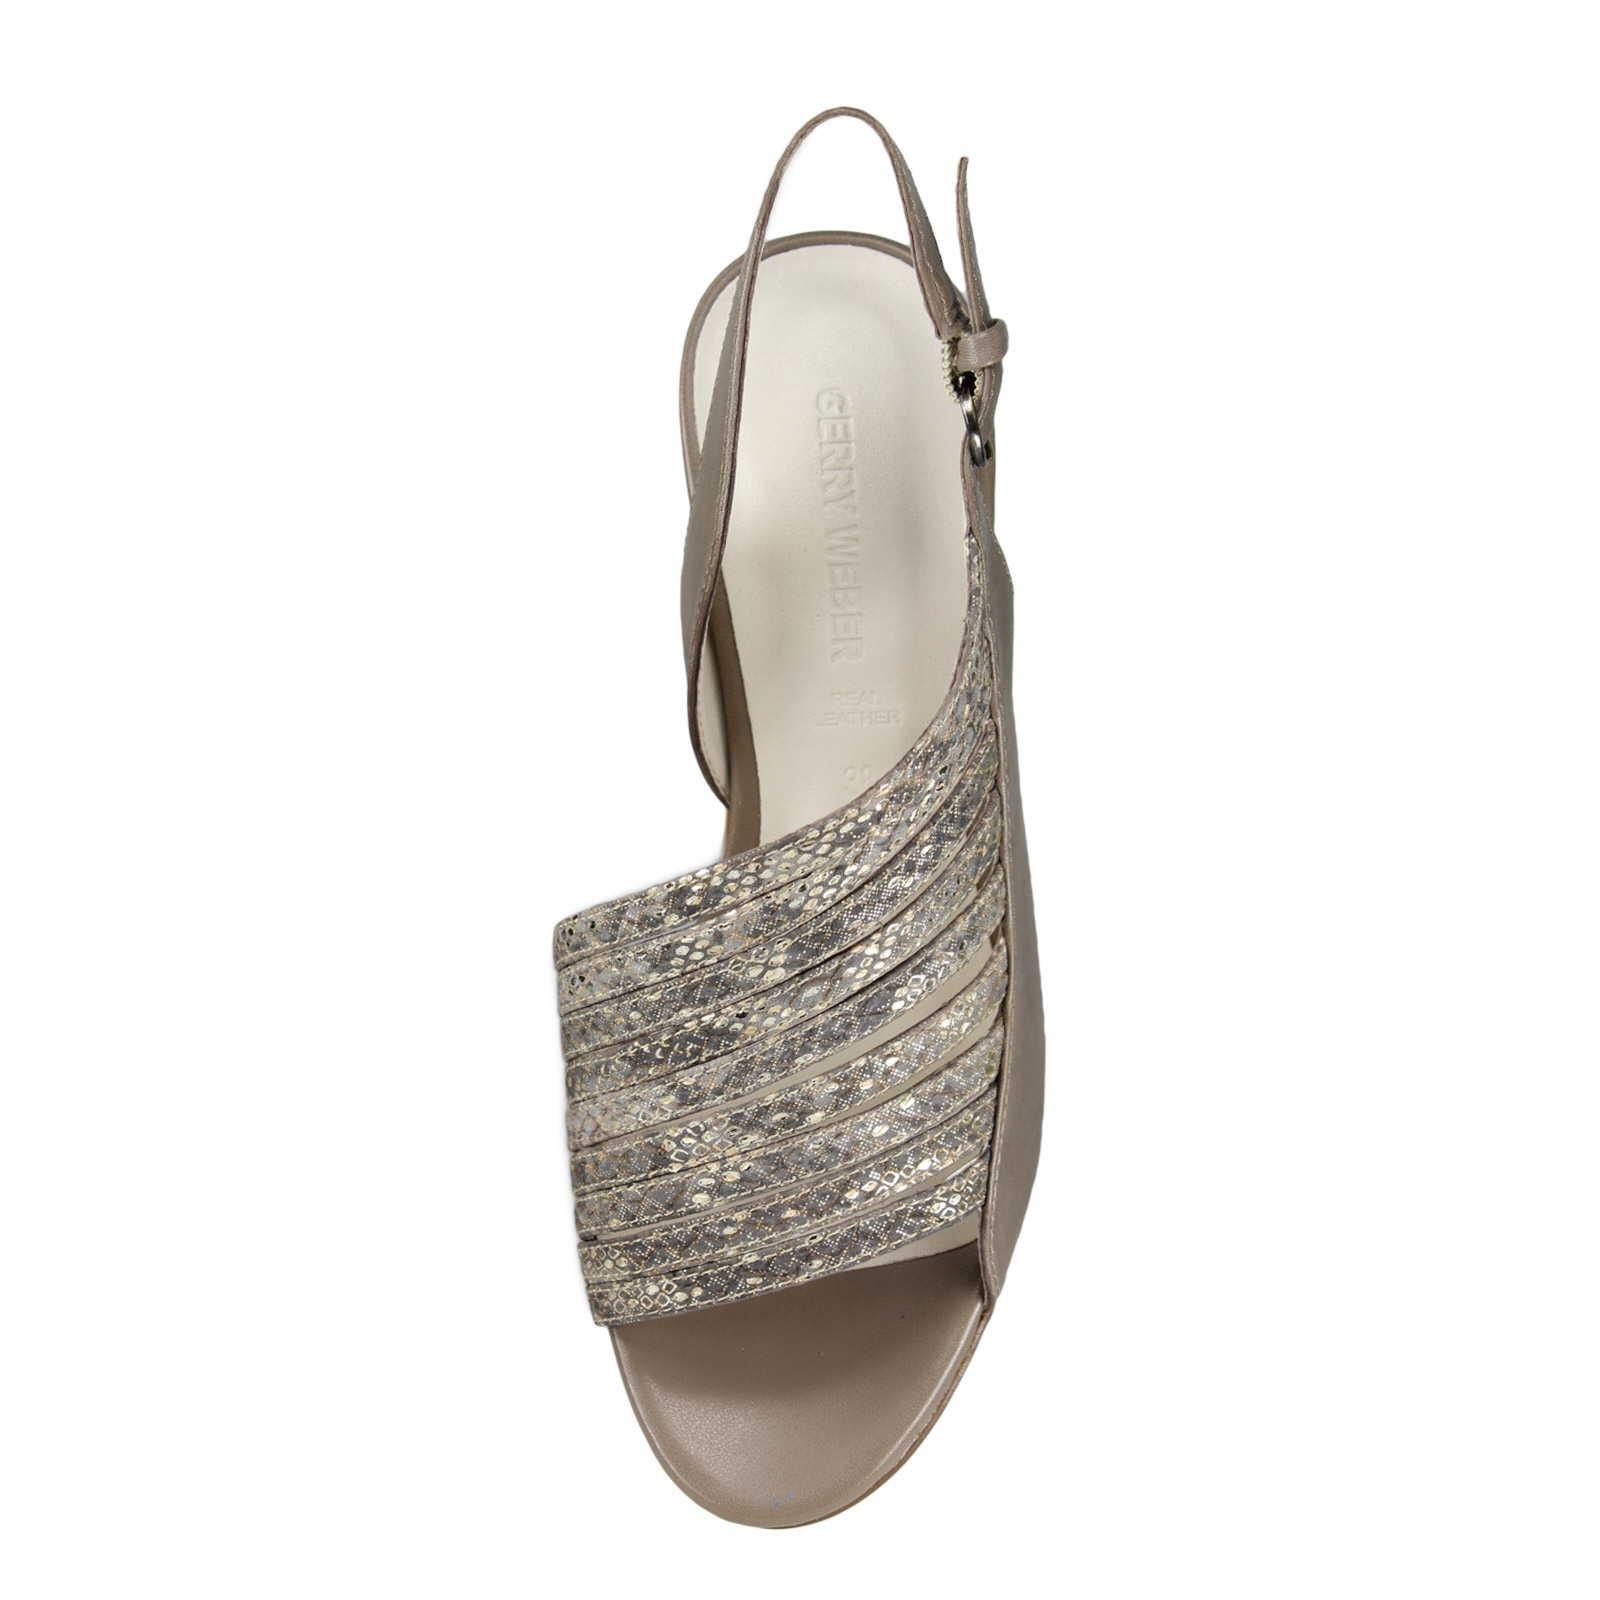 gerry weber shoes braun saskia 03 g39813 848 392 schuhparadies online shop schuhe. Black Bedroom Furniture Sets. Home Design Ideas